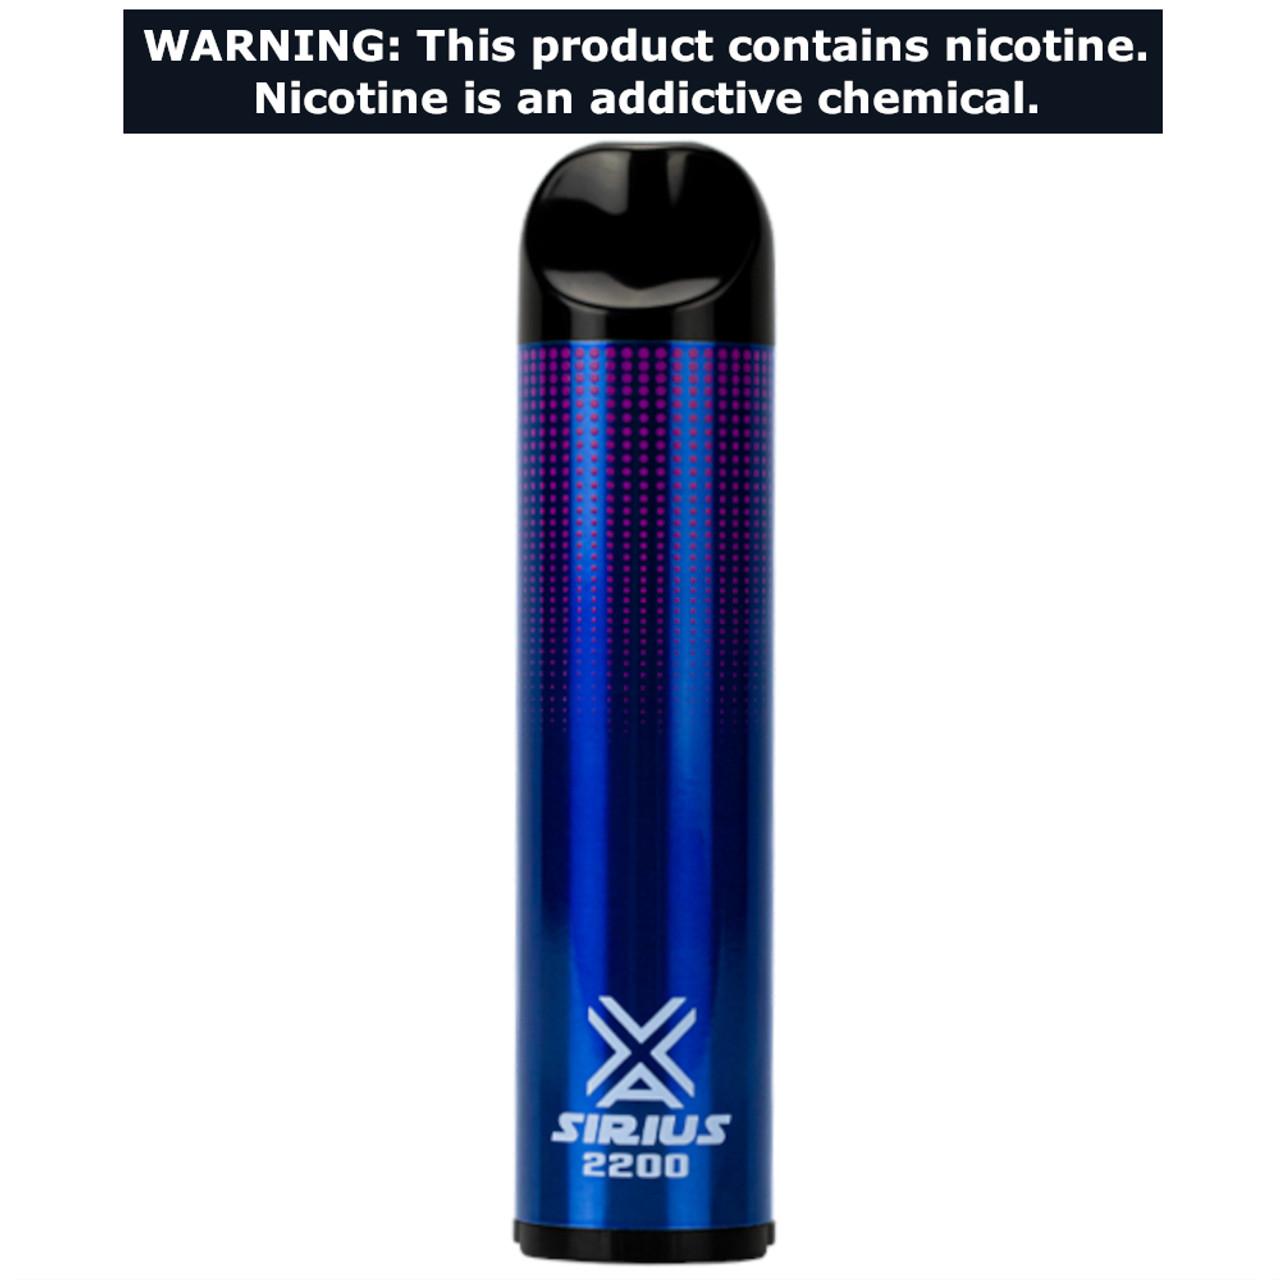 VaporLax Vape Sirius 2200 Flavored Disposables Blue Razz